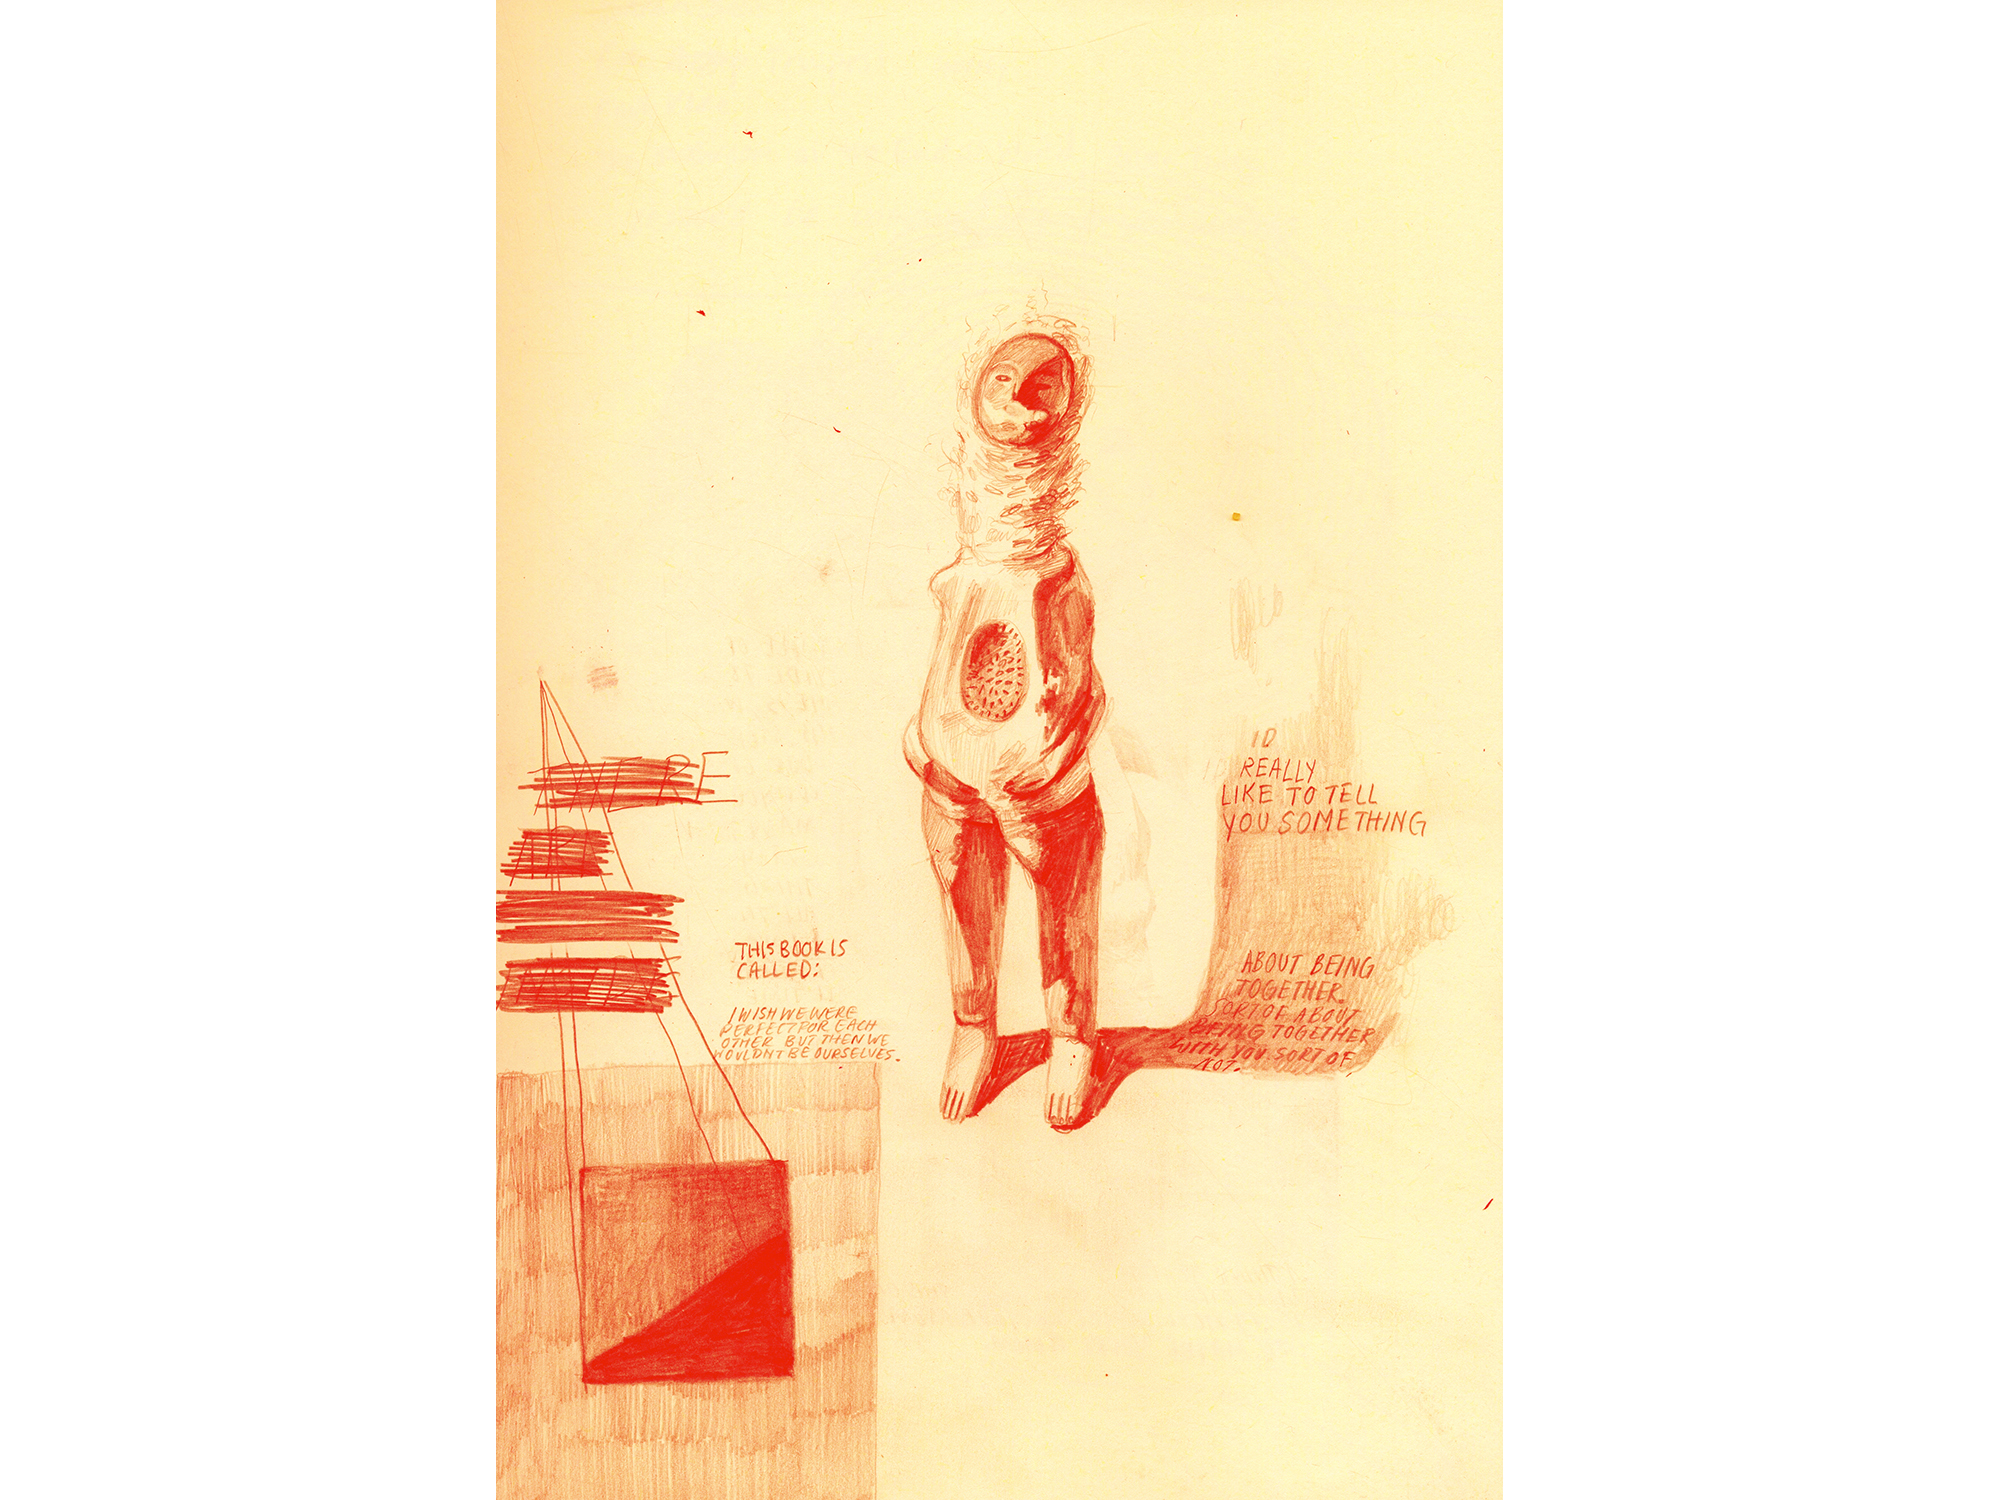 sgueglia_ruby_02-1